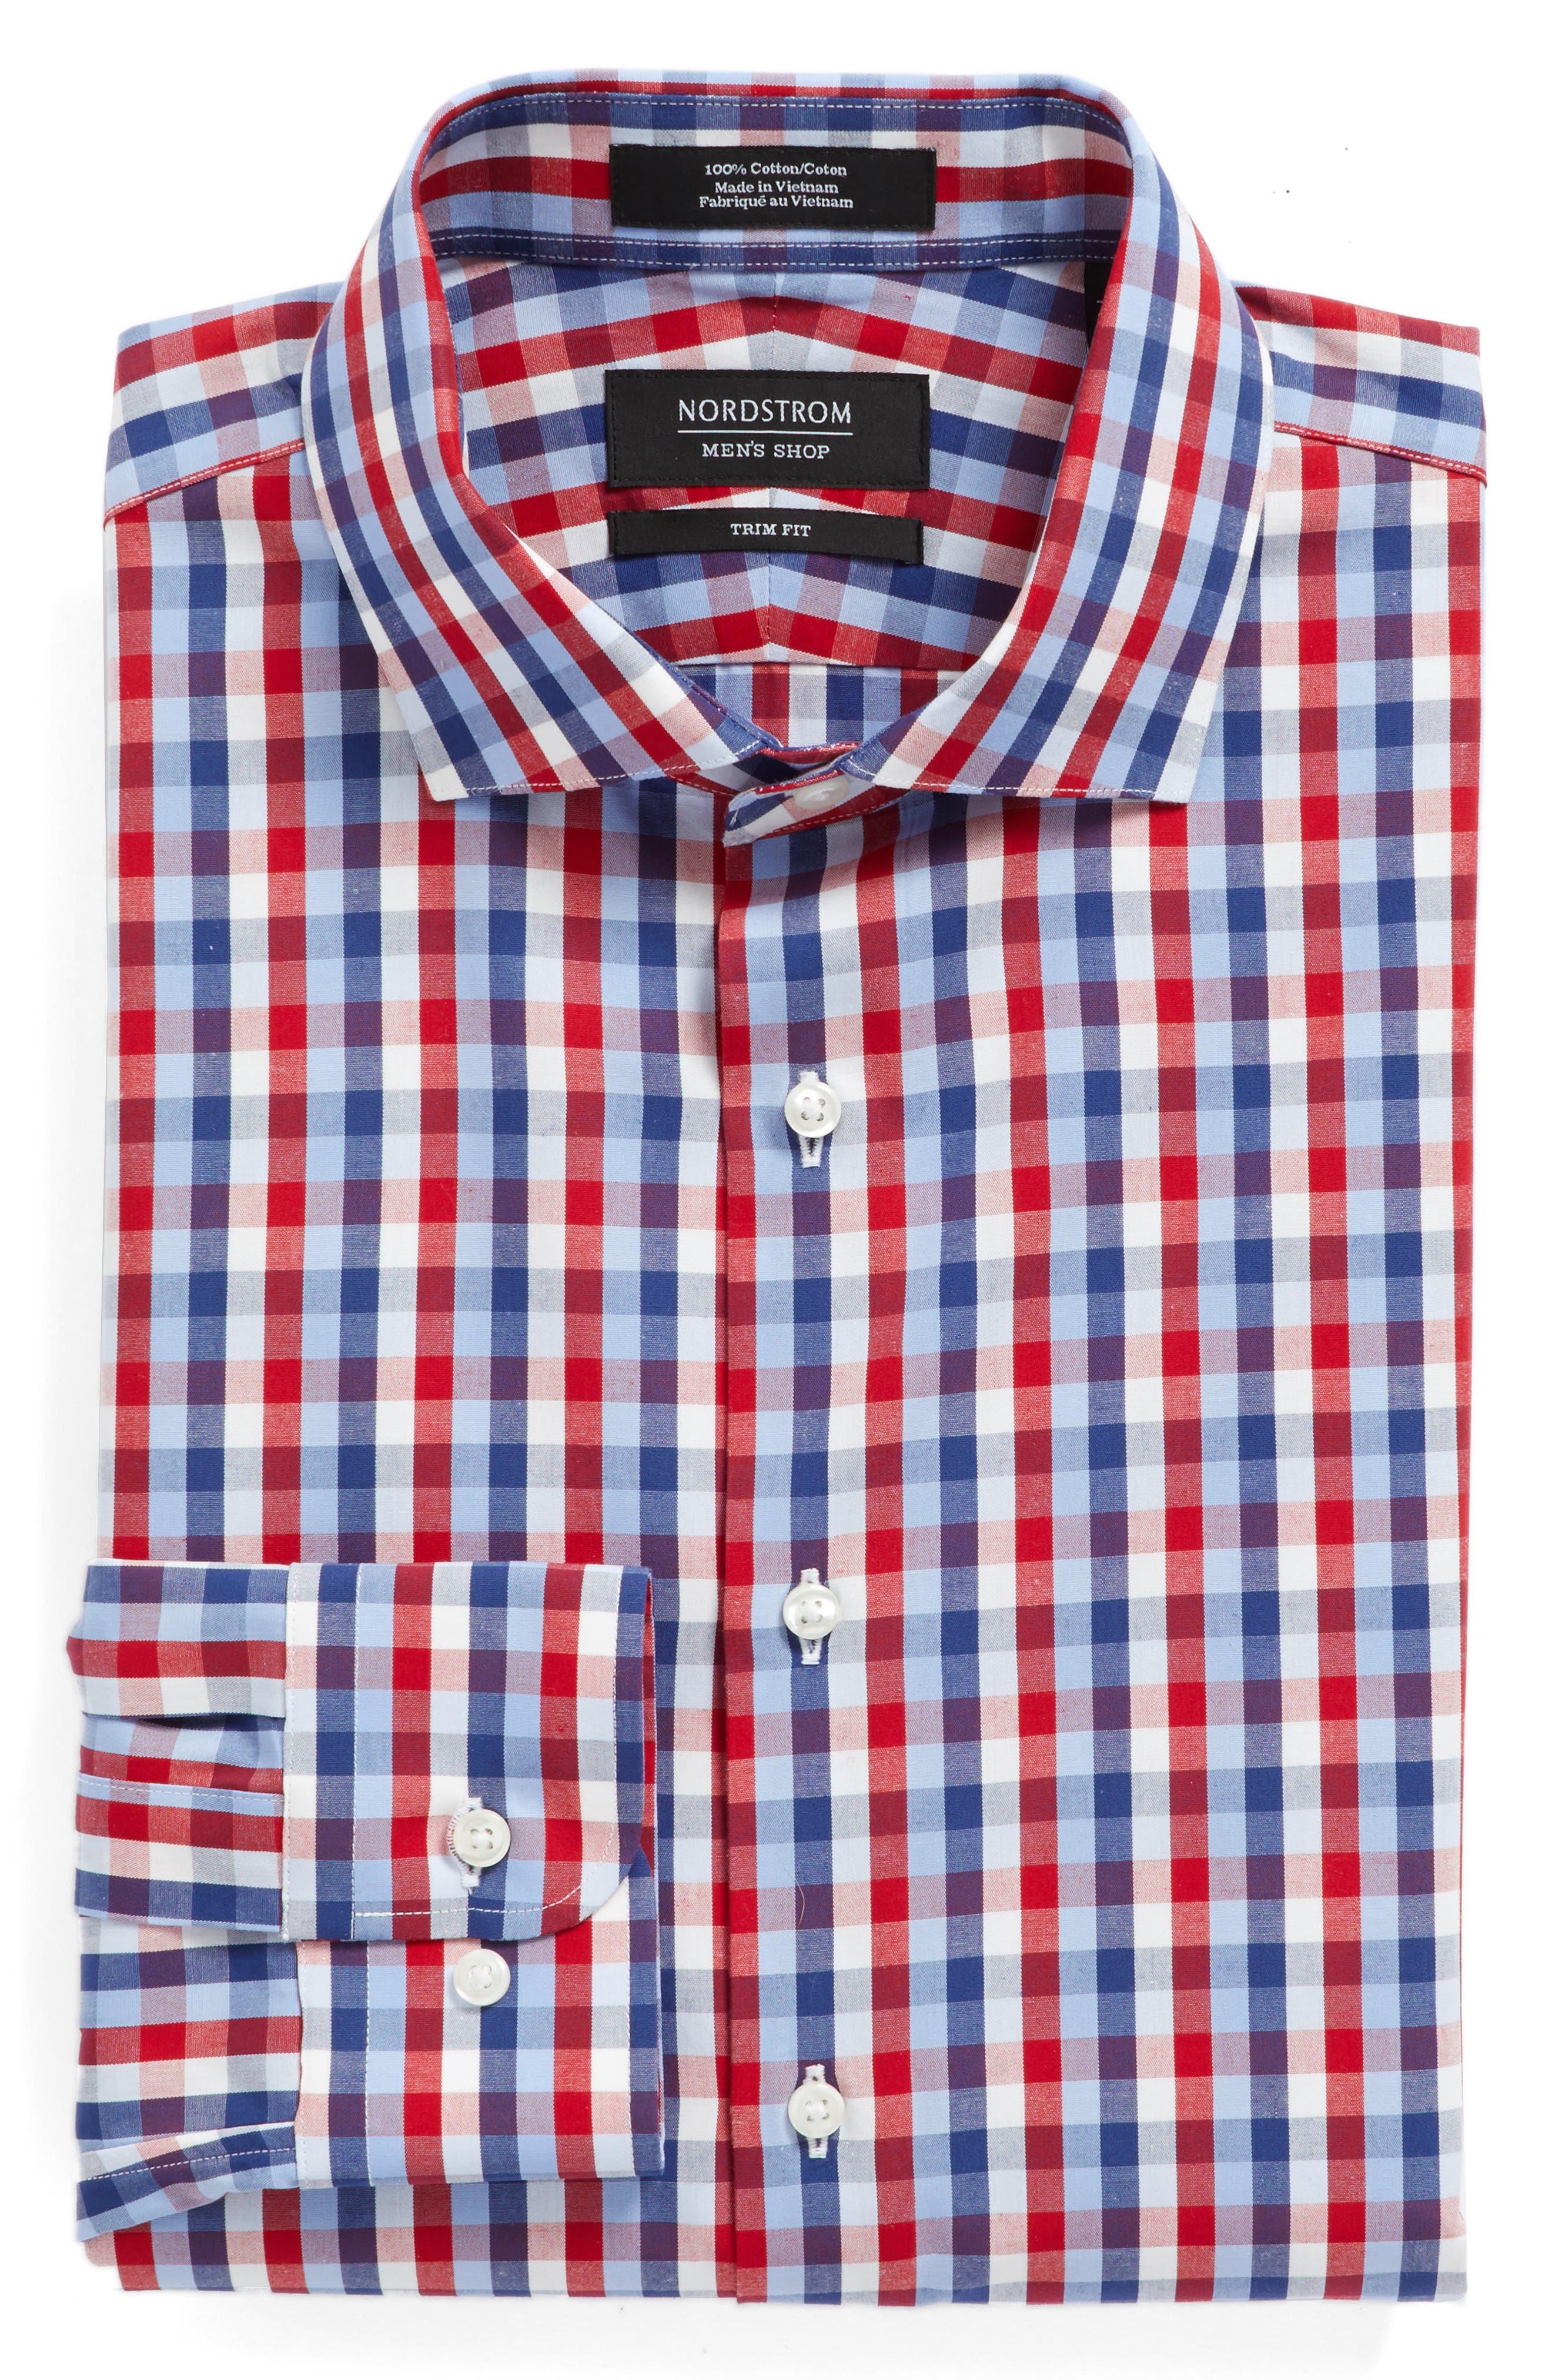 NORDSTROM MENS SHOP Trim Fit Check Dress Shirt